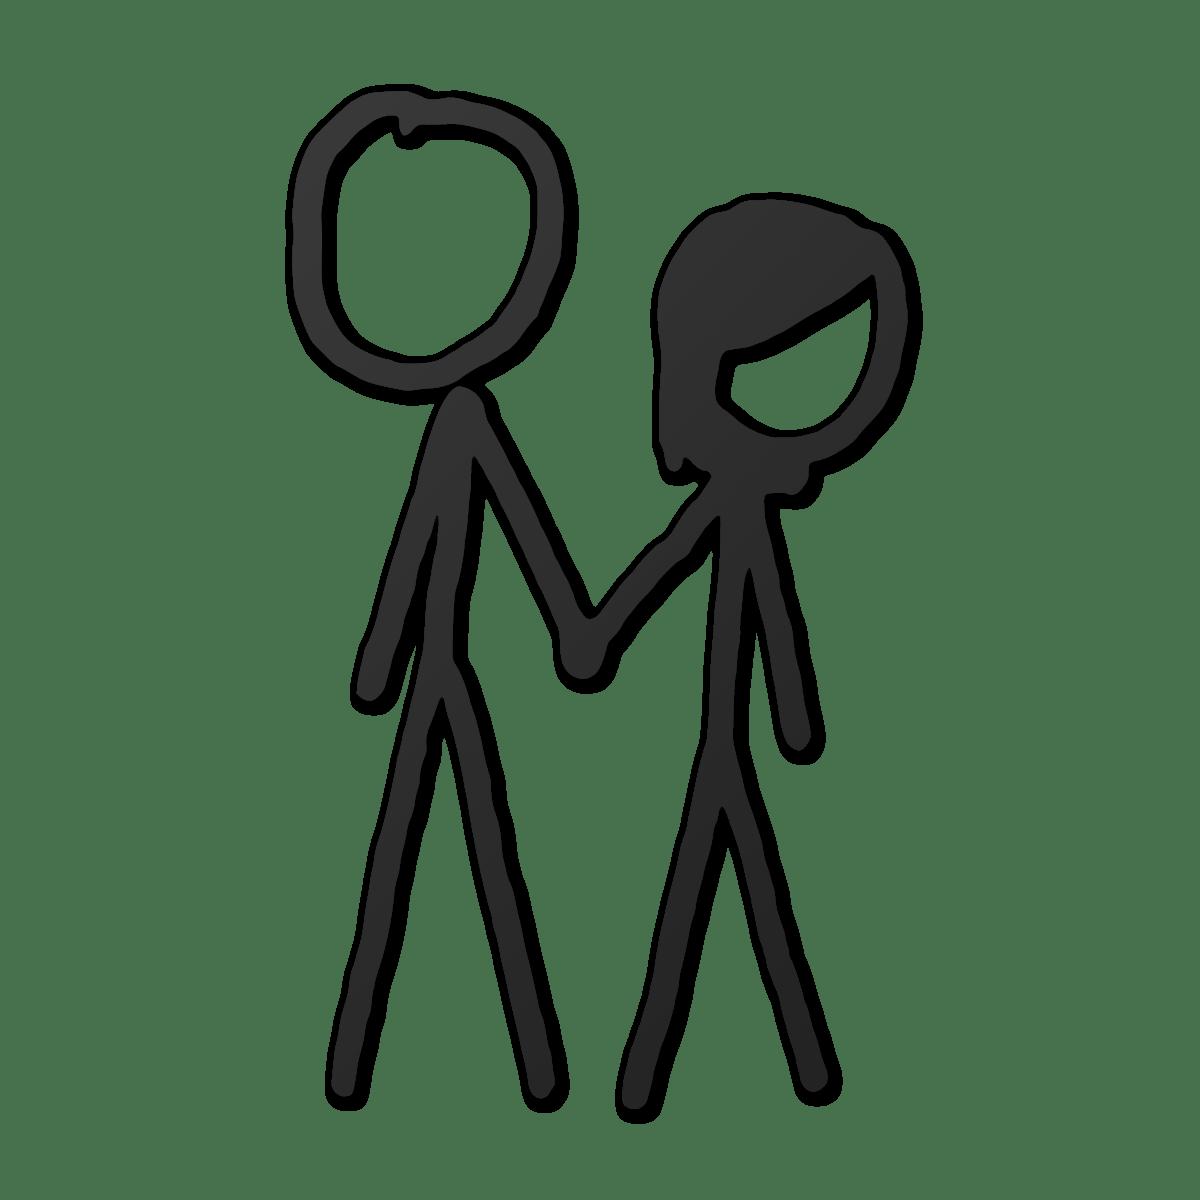 Stick Figure Drawings Of People